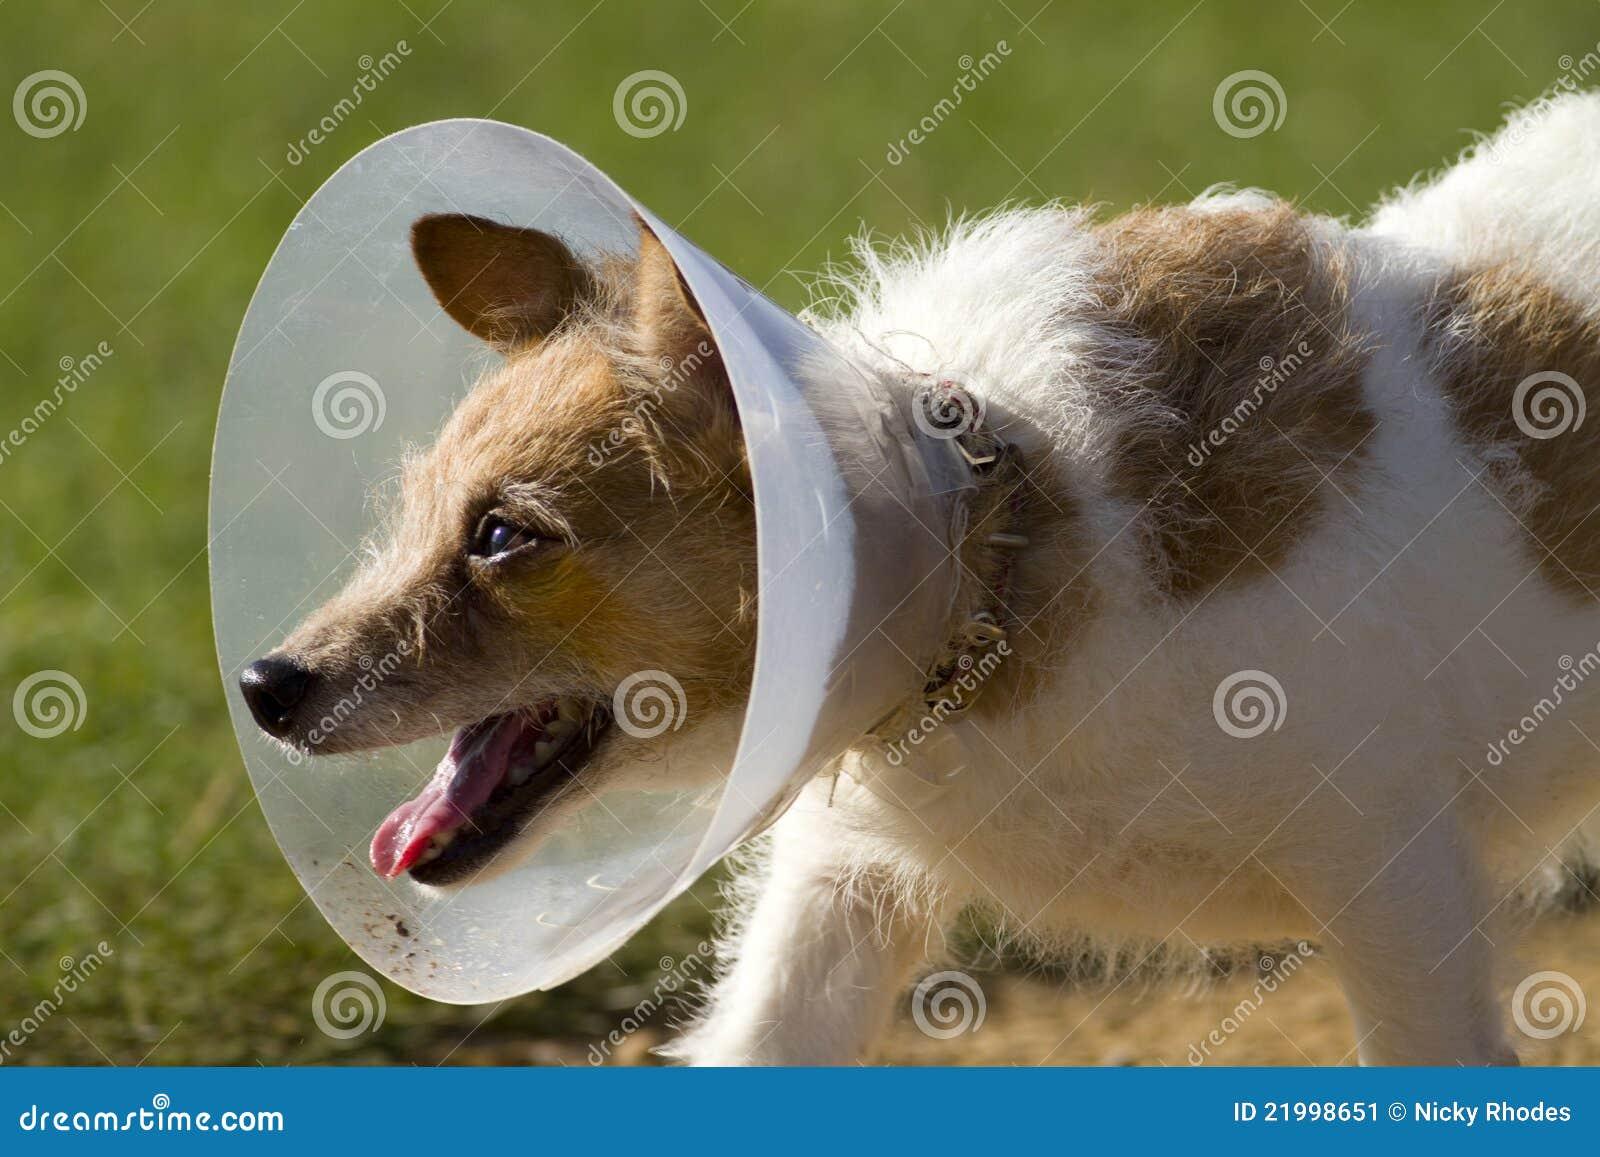 Dog Neck Injury From Collar